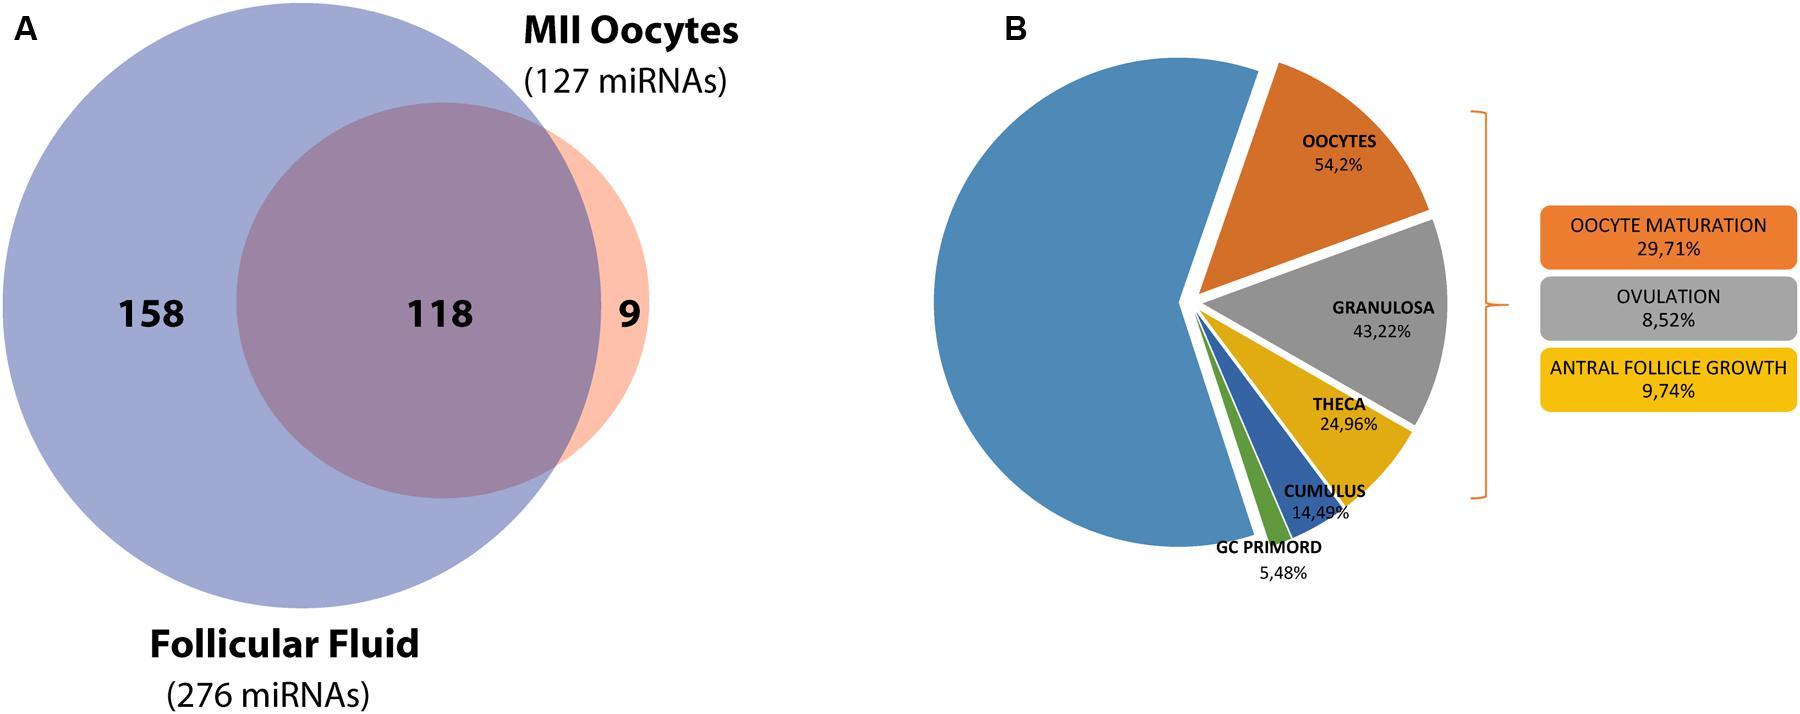 www frontiersin org  figure 1  mirna distribution in the ovarian follicle